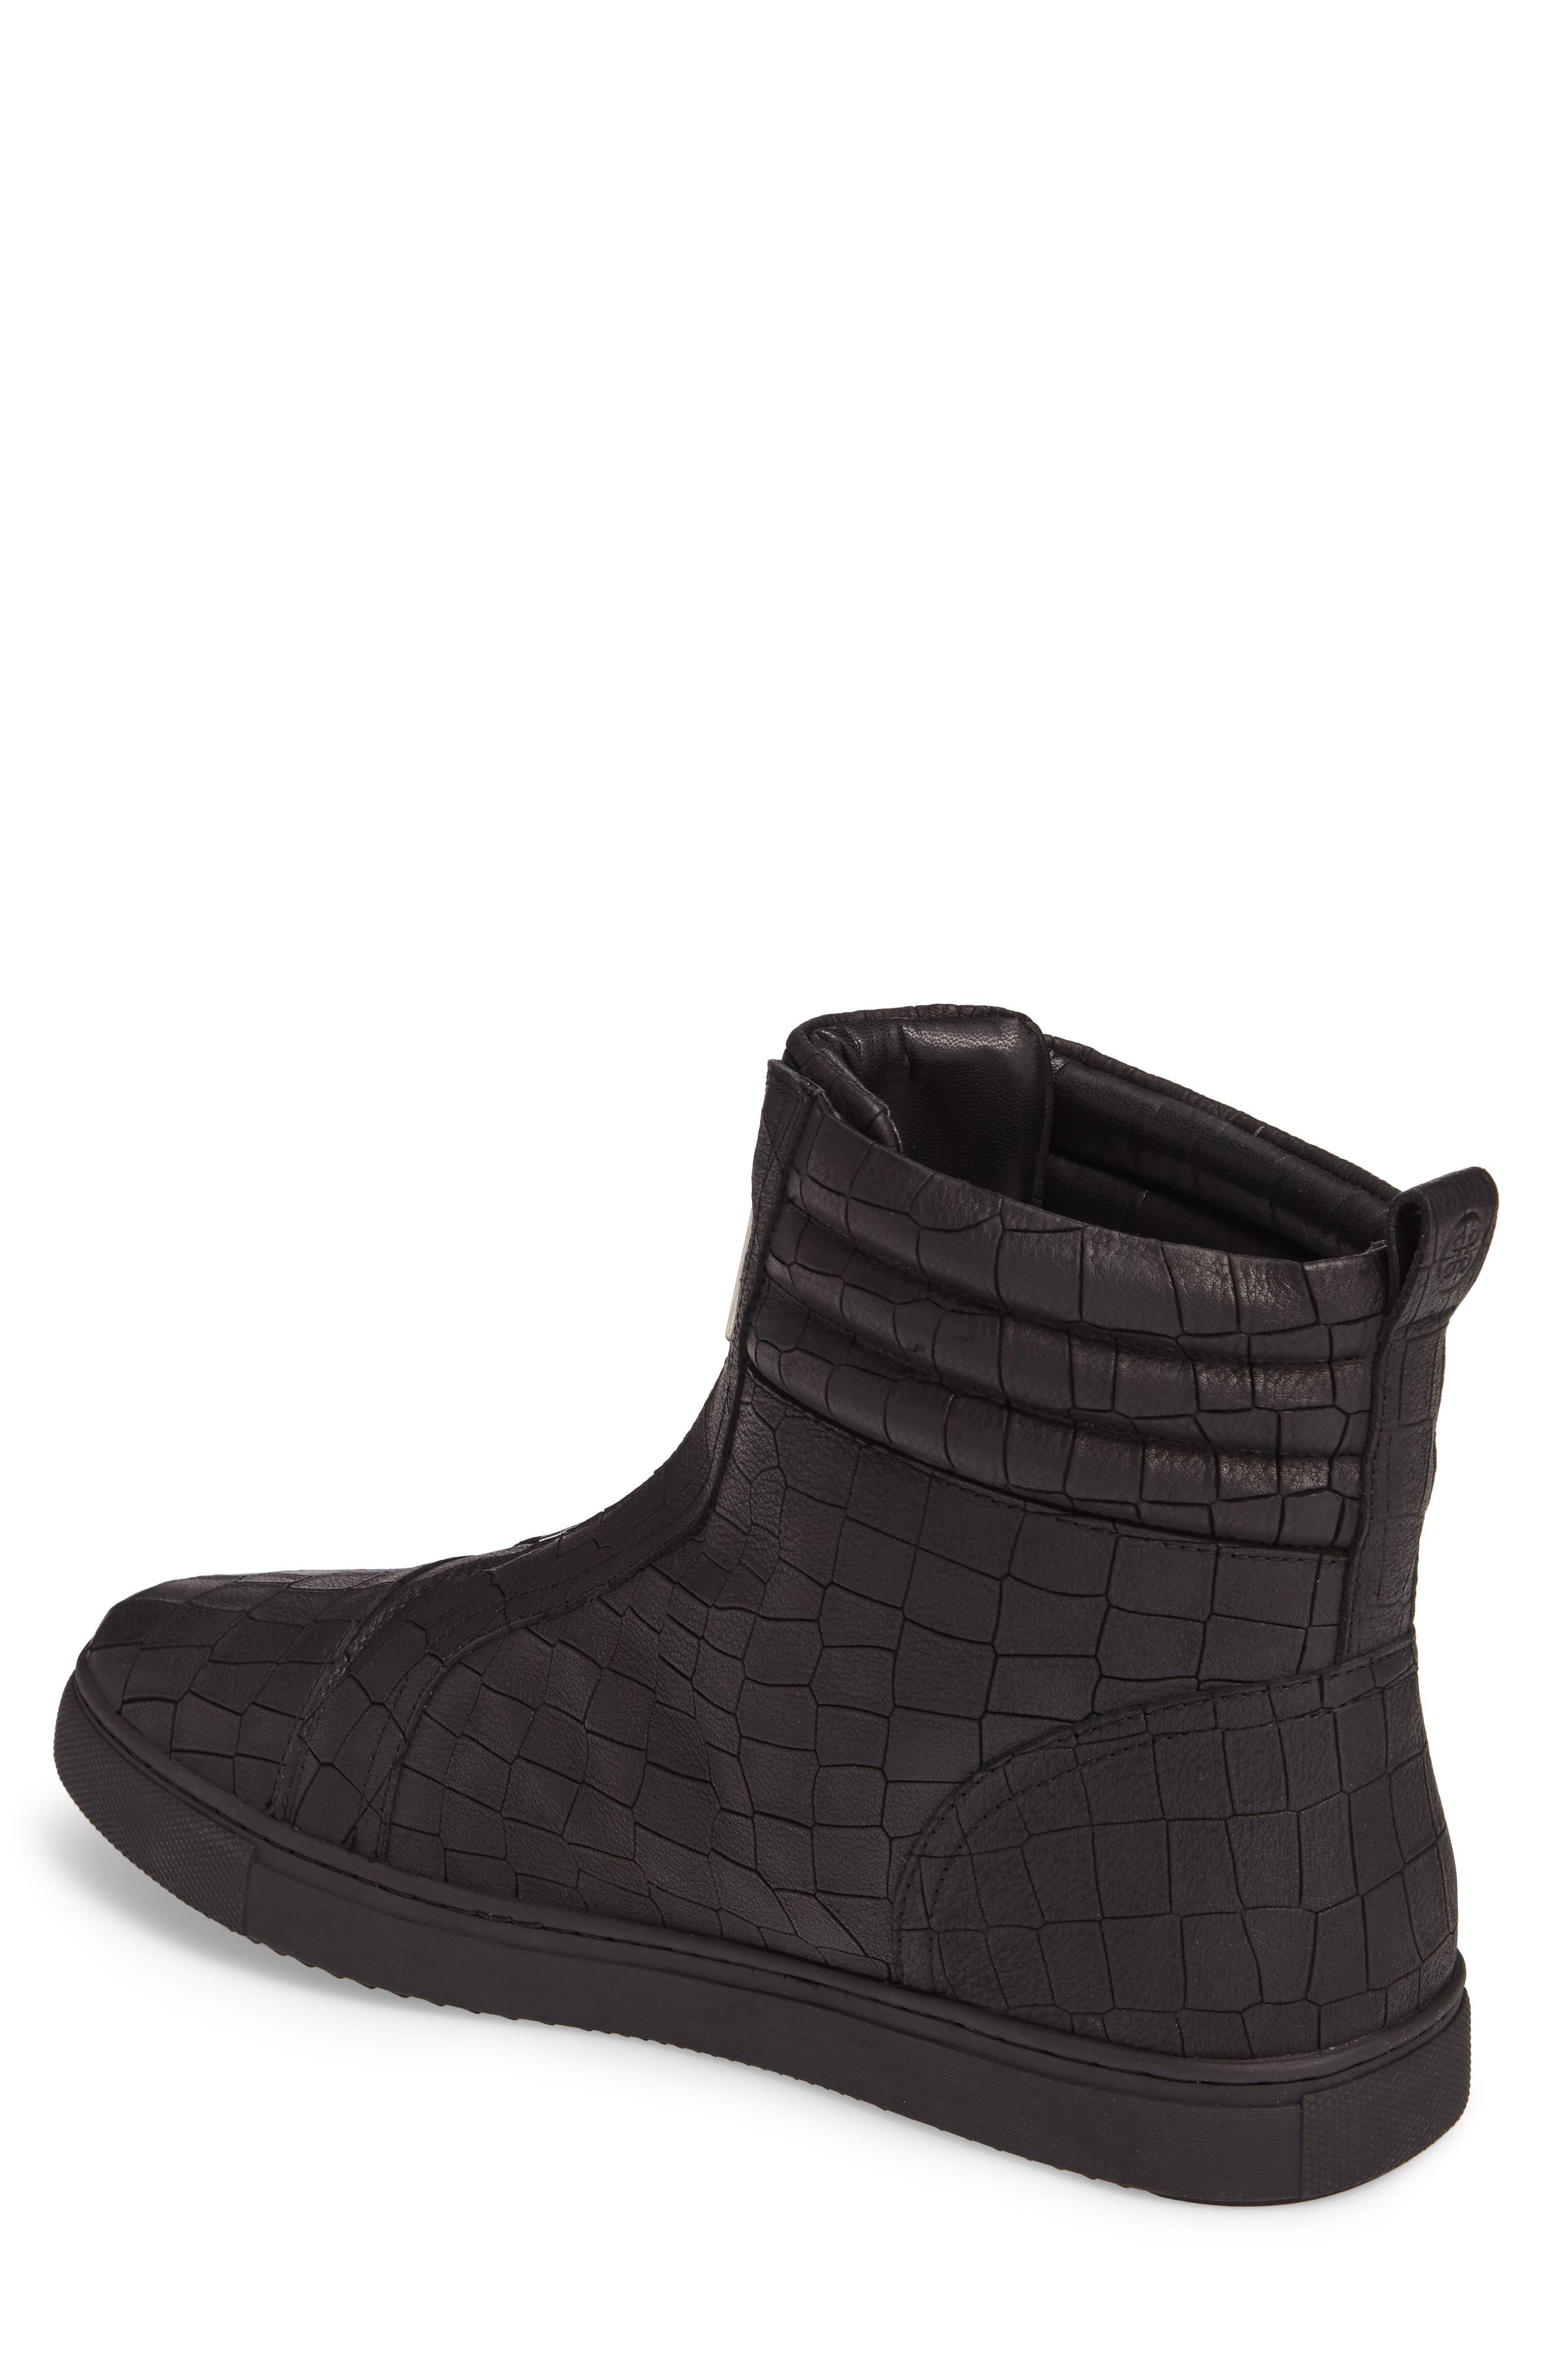 Hip & Bone Zip Boot,                             Alternate thumbnail 2, color,                             Black Croc Leather